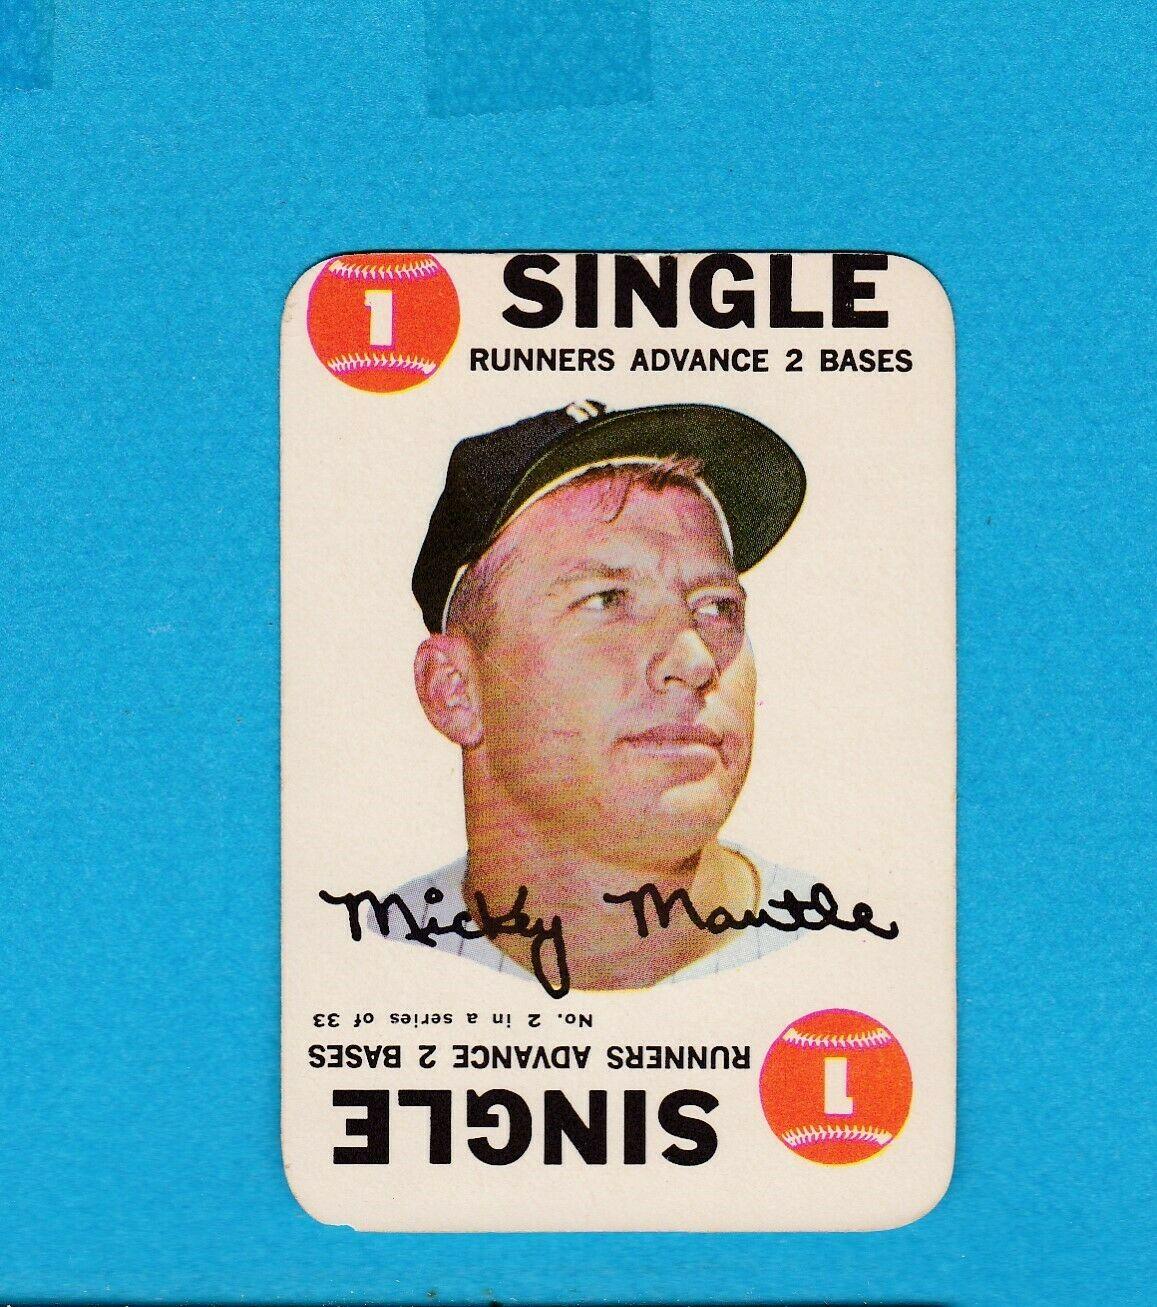 1968 TOPPS BASEBALL SET BREAK GAME CARD 2 MICKEY MANTLE VG+ - Image 1